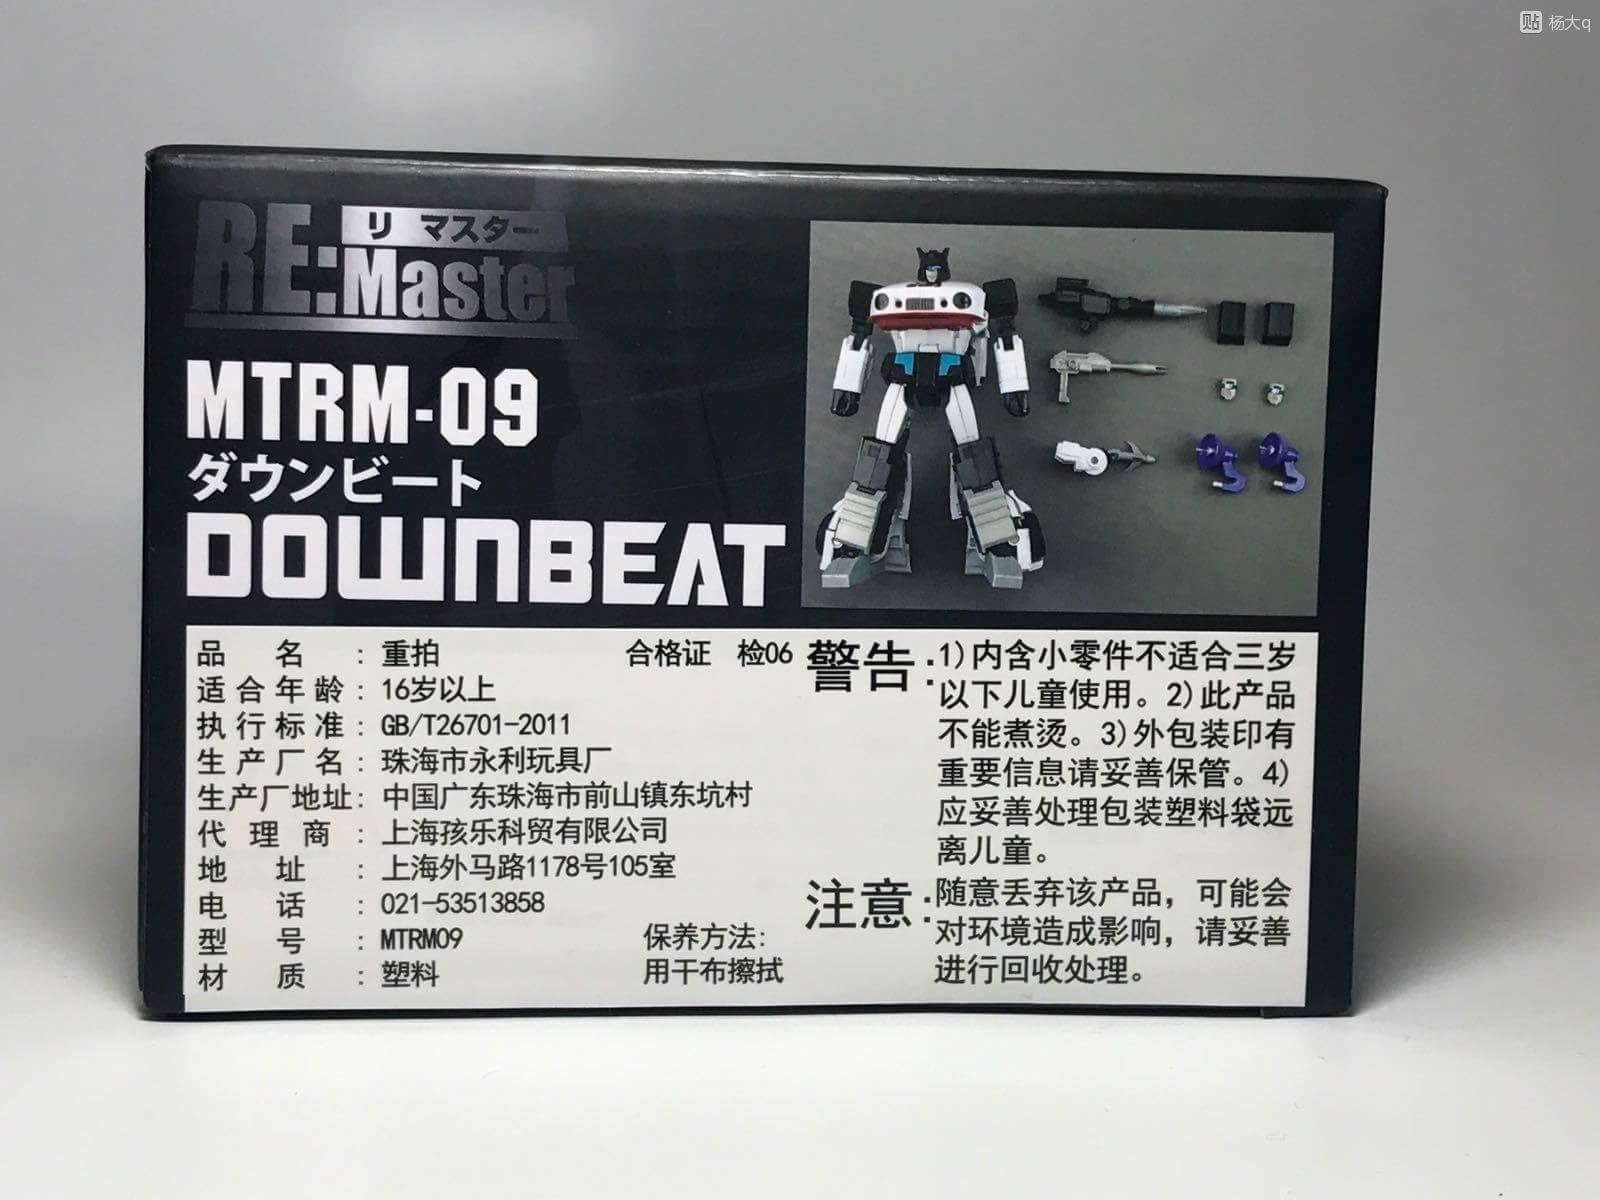 [Maketoys] Produit Tiers - Jouet MTRM-09 Downbeat - aka Jazz/Saxo et MTRM-09ST BounceBack - aka Stepper - Page 3 YjwD8r9R